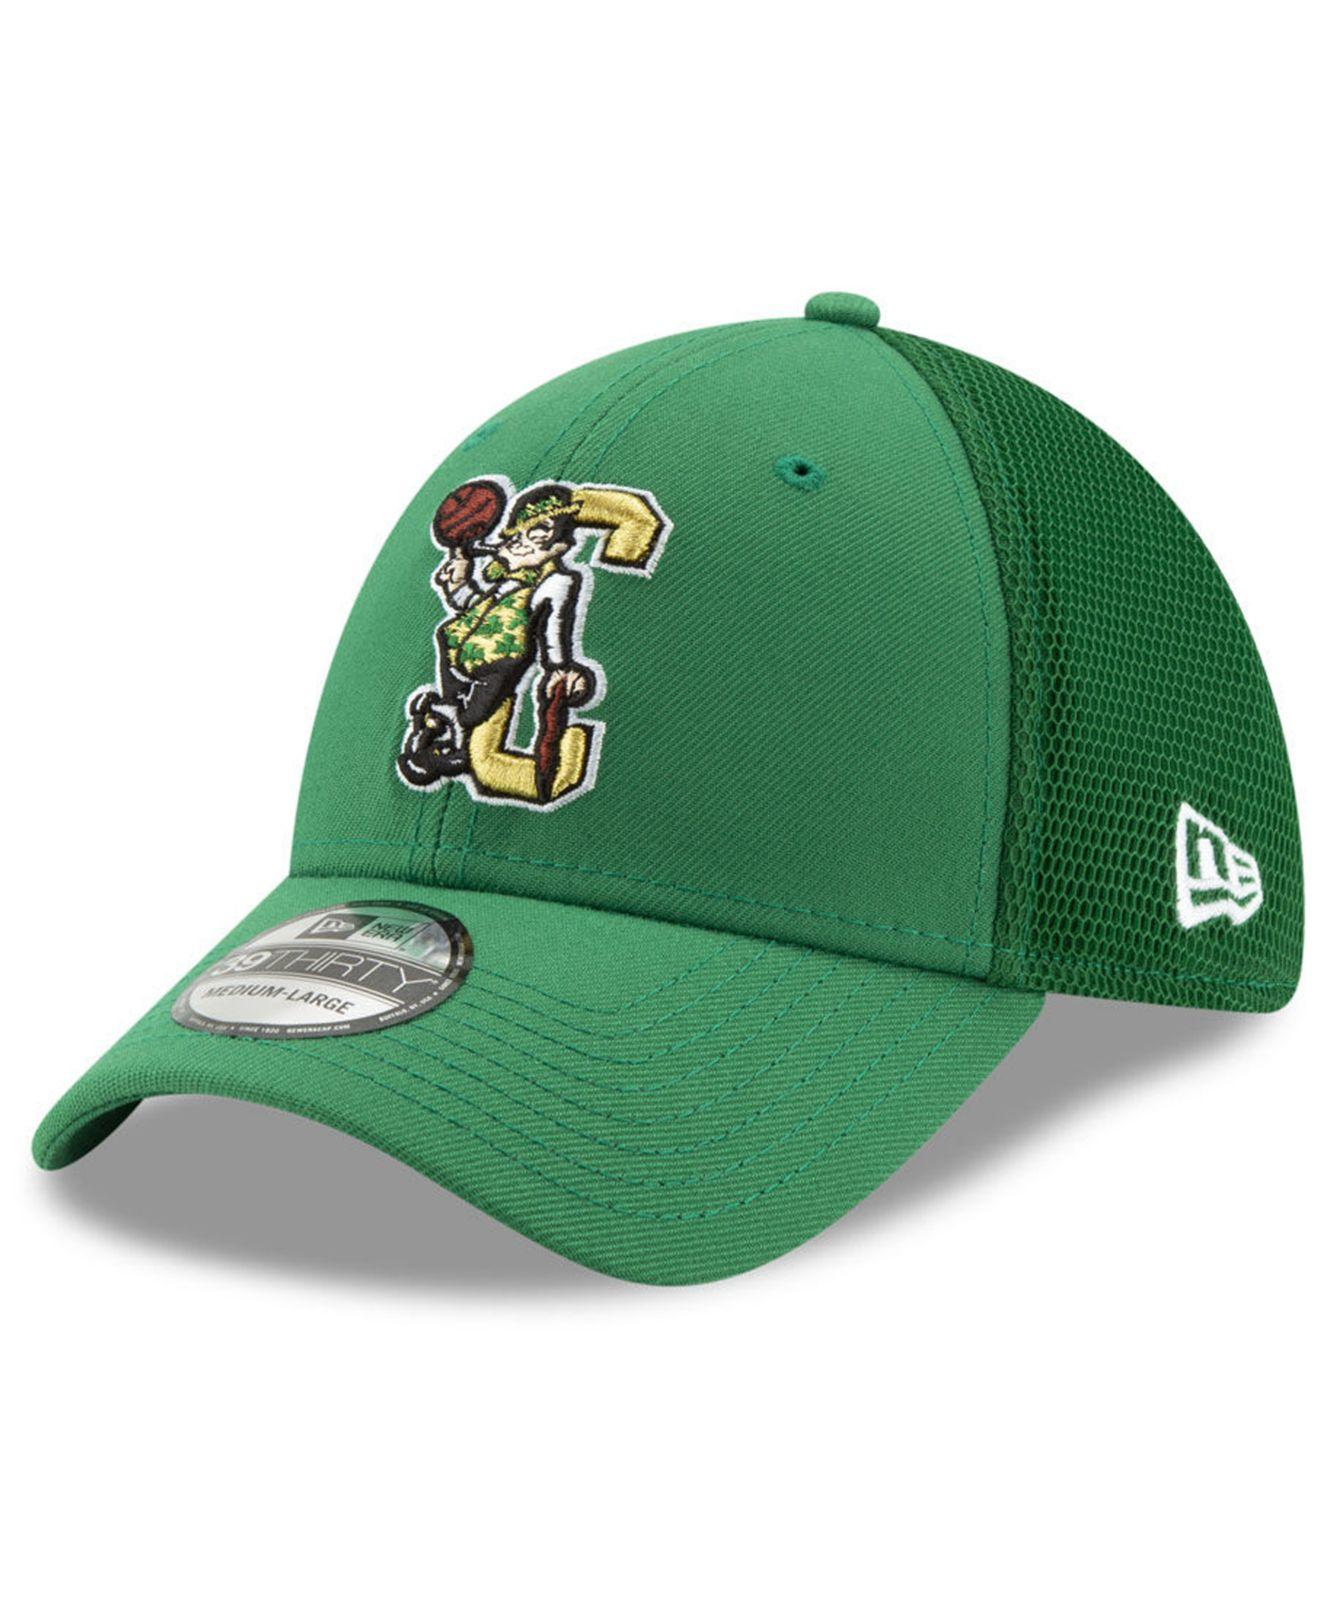 official photos b0e91 cd952 Lyst - KTZ Boston Celtics Back Half 39thirty Cap in Green for Men